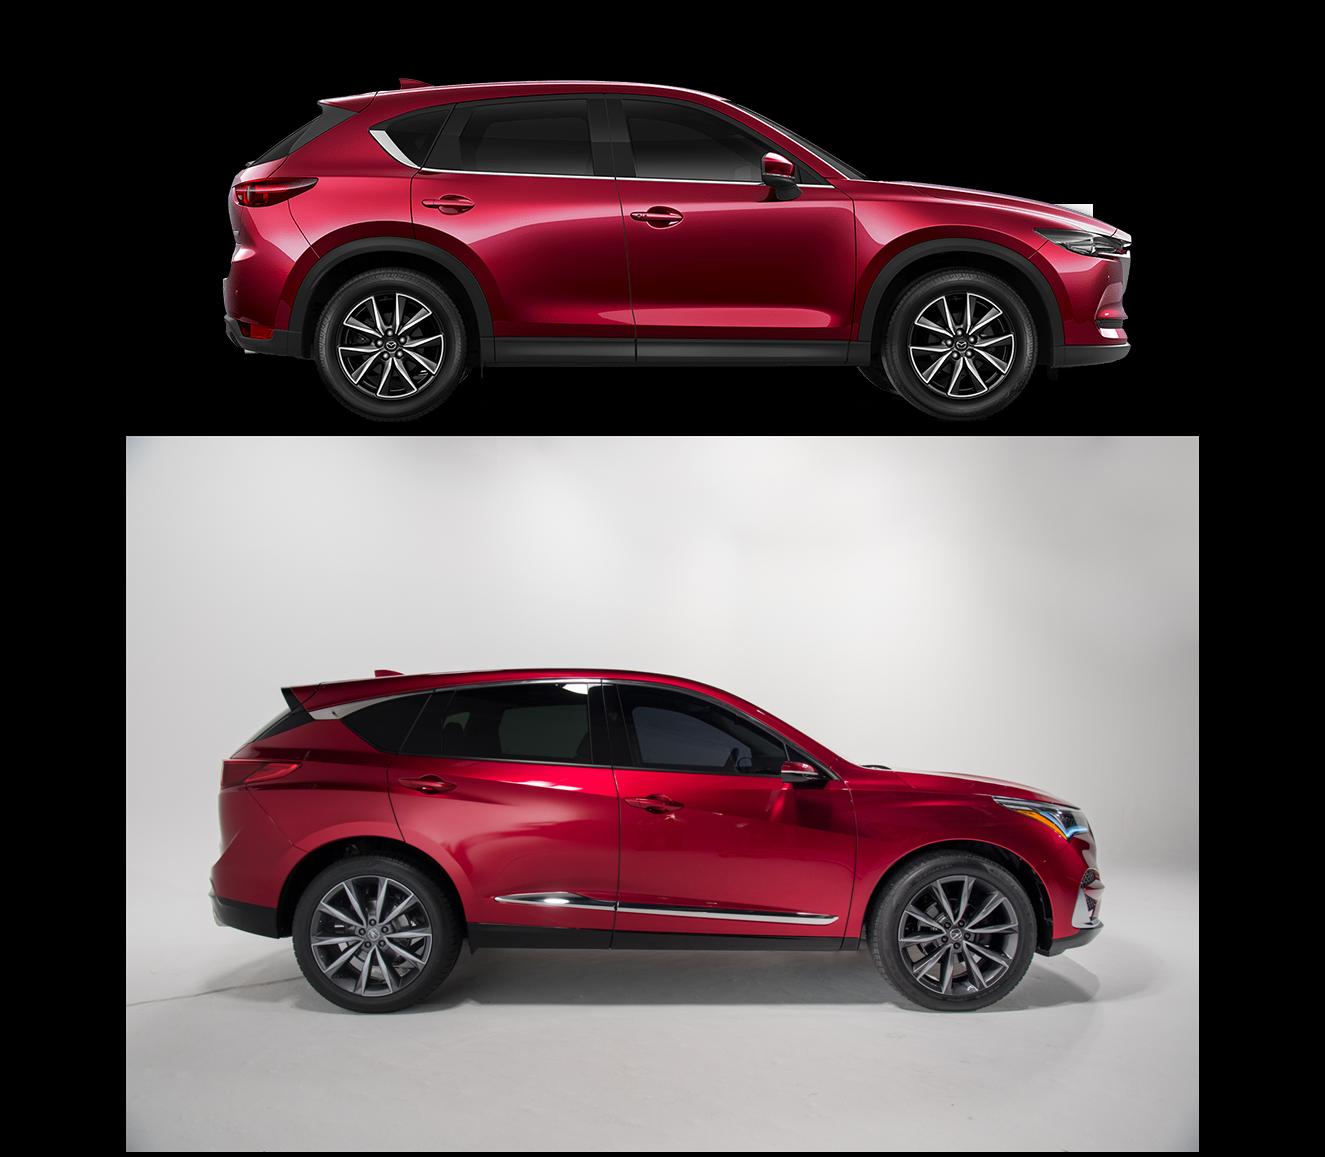 Overhauled 2019 Acura RDX Crossover Debuts » AutoGuide.com